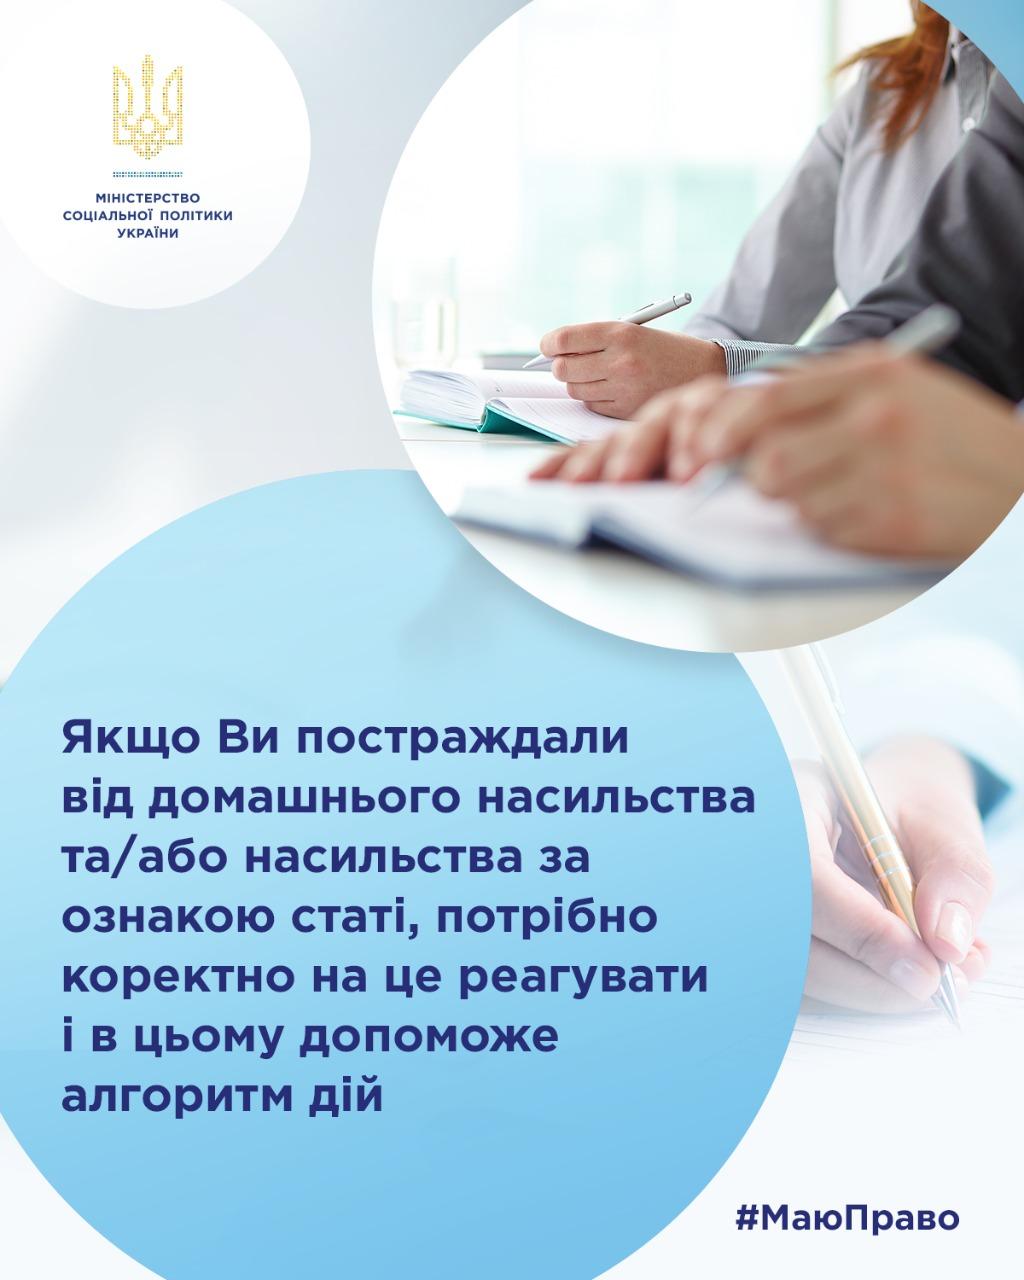 https://www.msp.gov.ua/files/pictures/2021/2307-2.jpeg